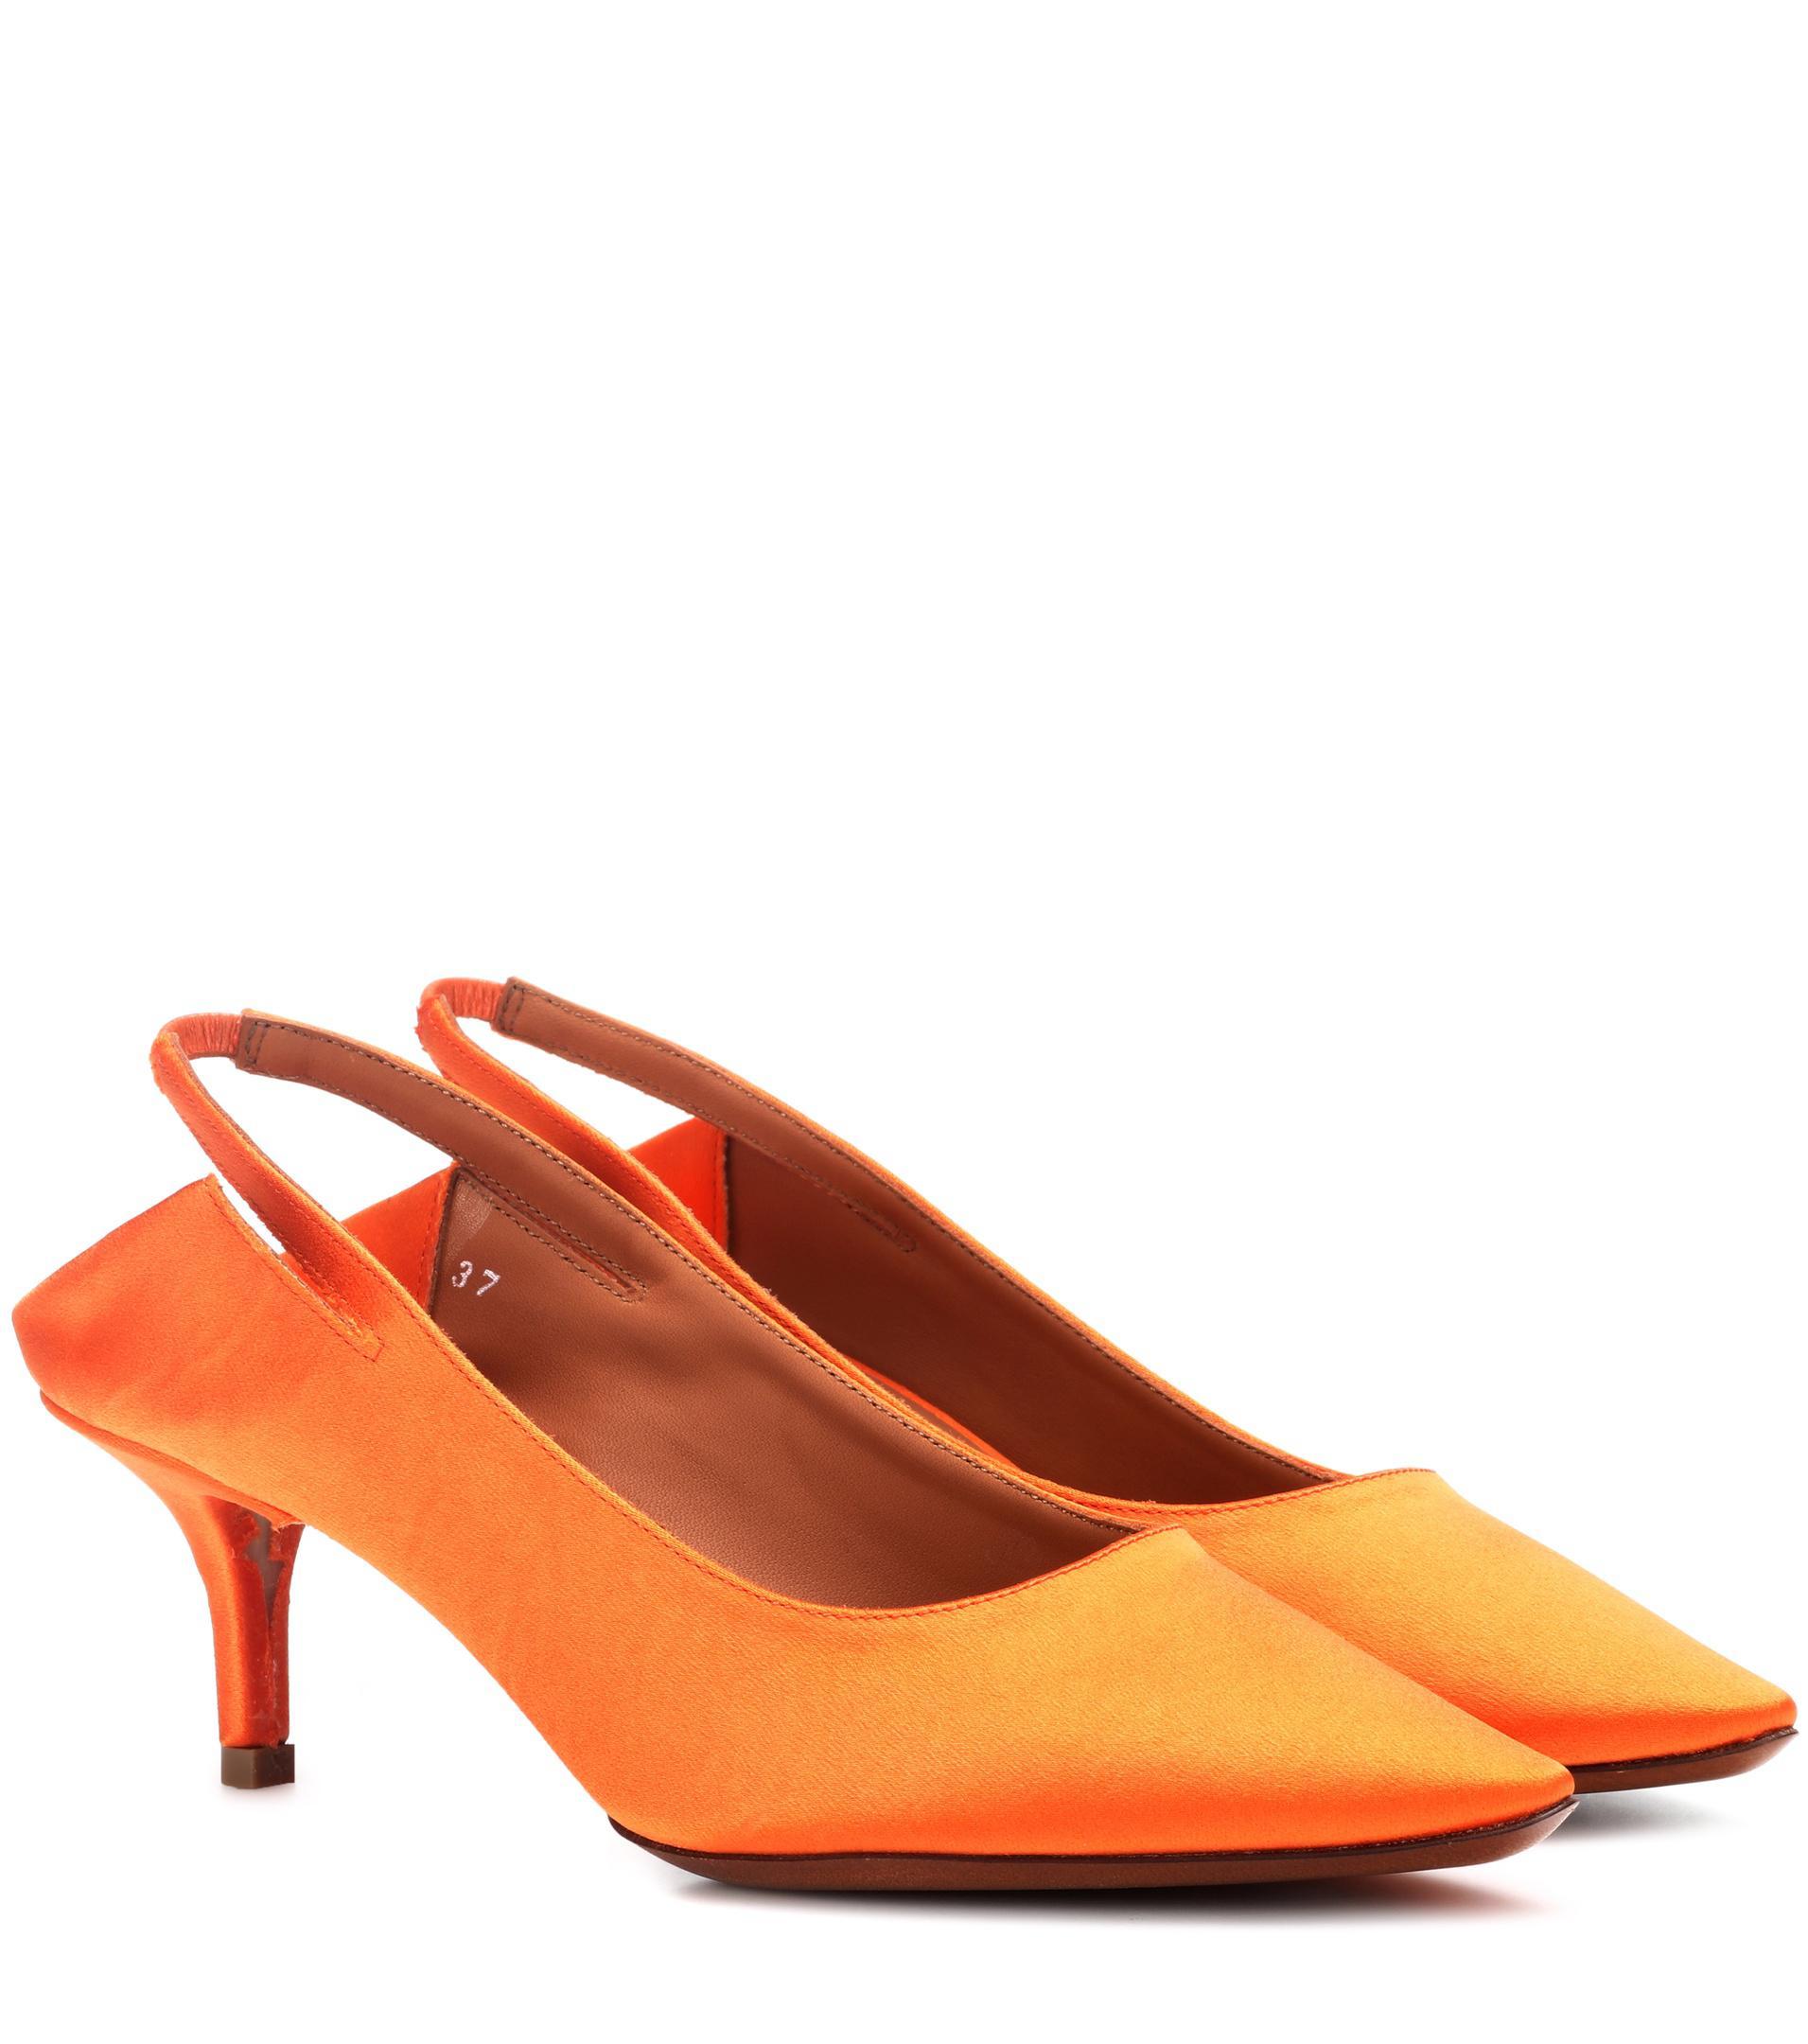 263f2889efe5e Vetements Orange Slingback Satin Pumps. View fullscreen